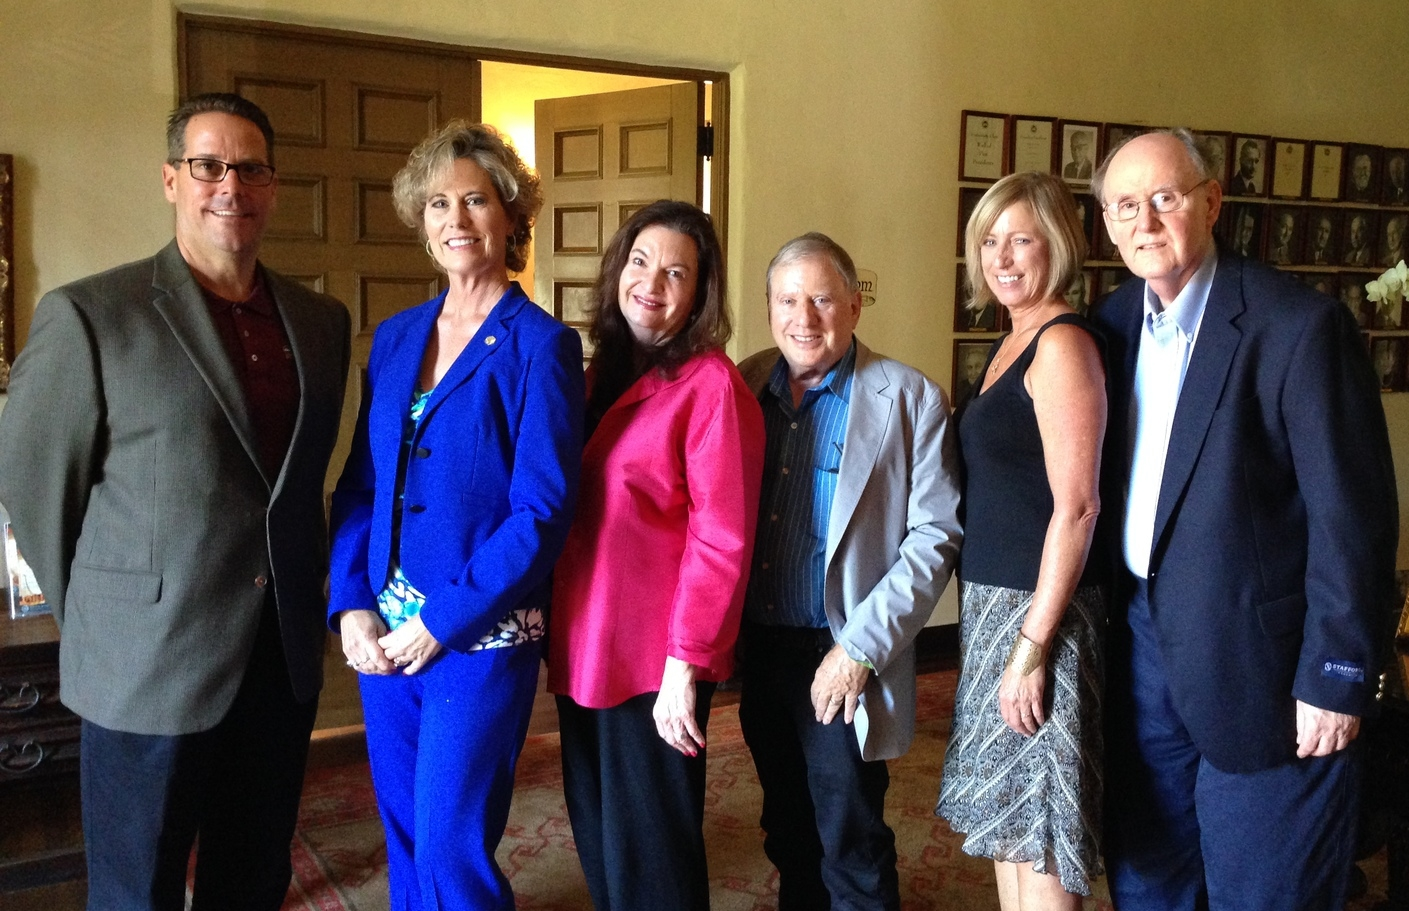 Steven M. Woodward (left), Annette Jorgensen, Jennifer Goddard Combs, Gary Kravetz, Trish Miller and Eldon R. Edwards. Not pictured: Michael O'Kelley and Denny Cooper.